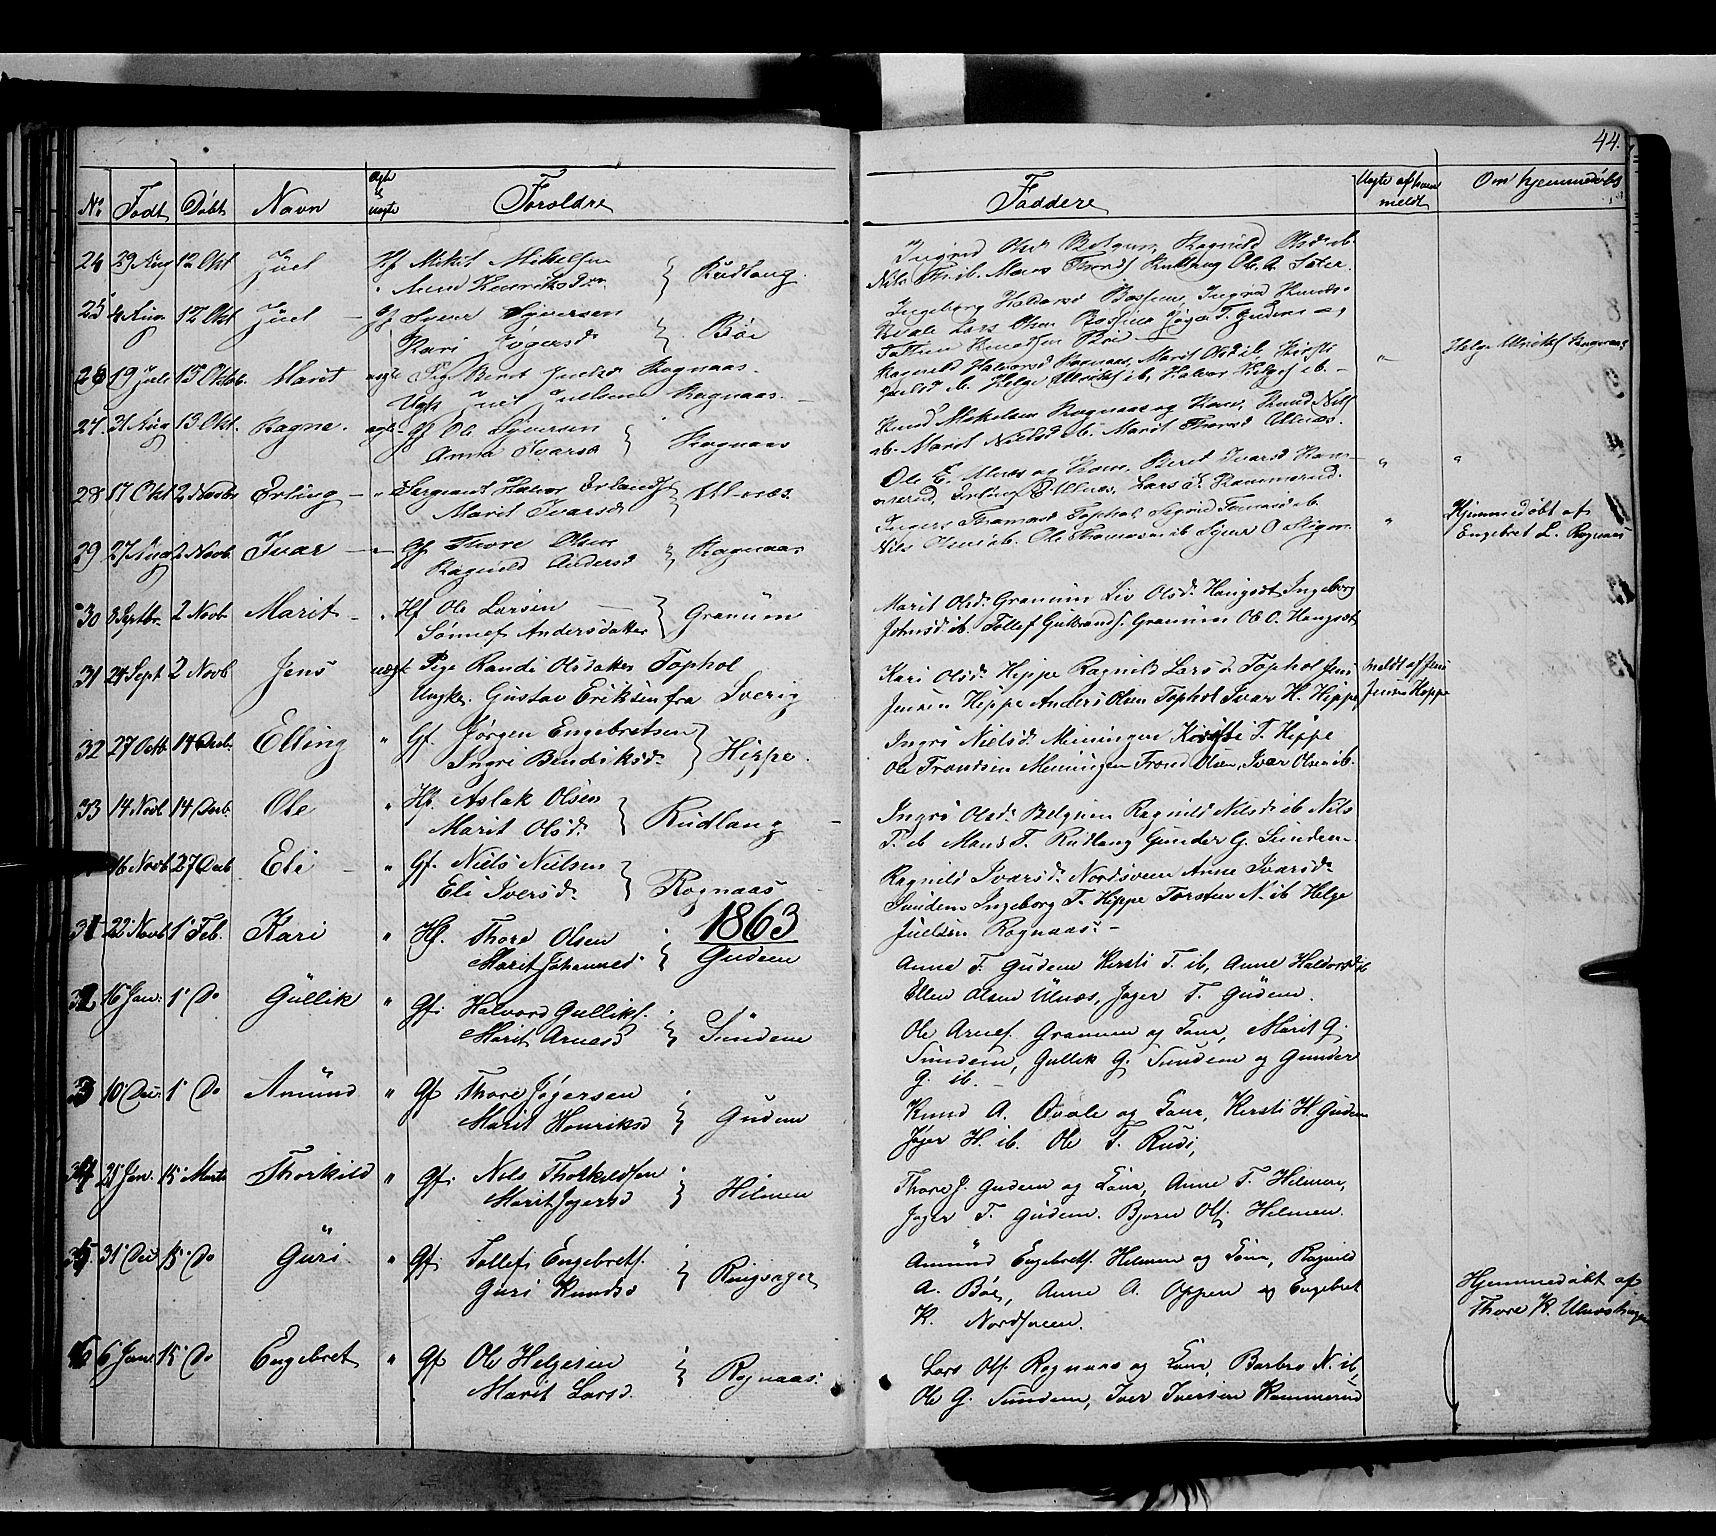 SAH, Nord-Aurdal prestekontor, Ministerialbok nr. 6, 1842-1863, s. 44